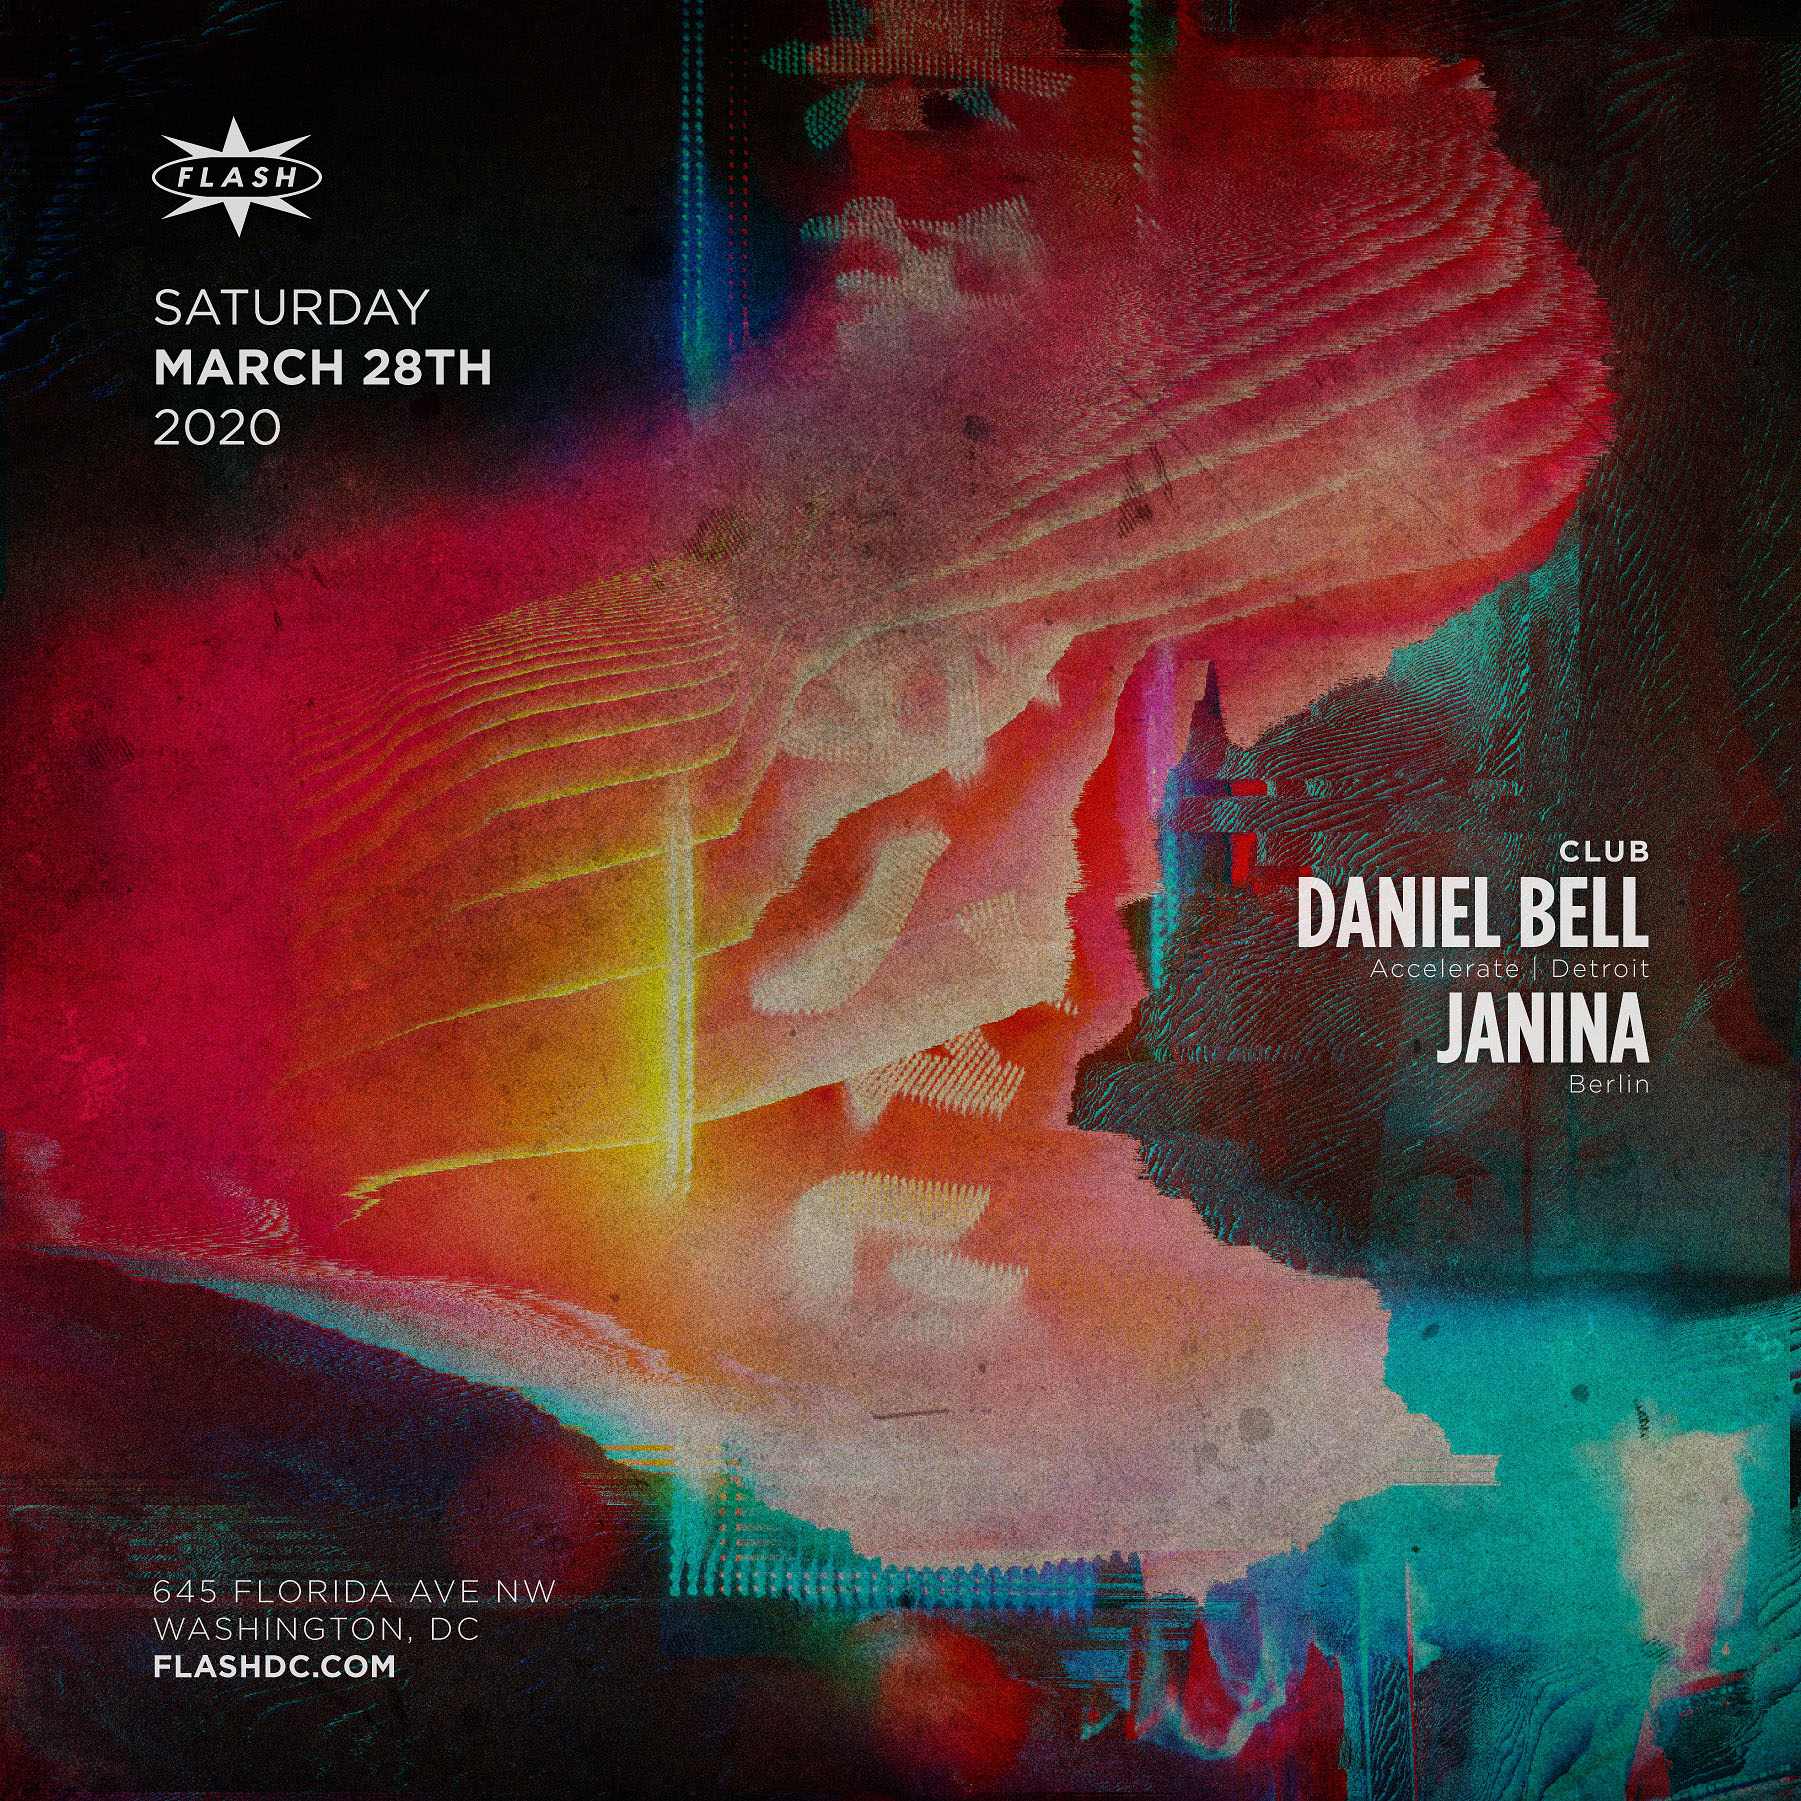 [Postponed] Daniel Bell - Janina event thumbnail